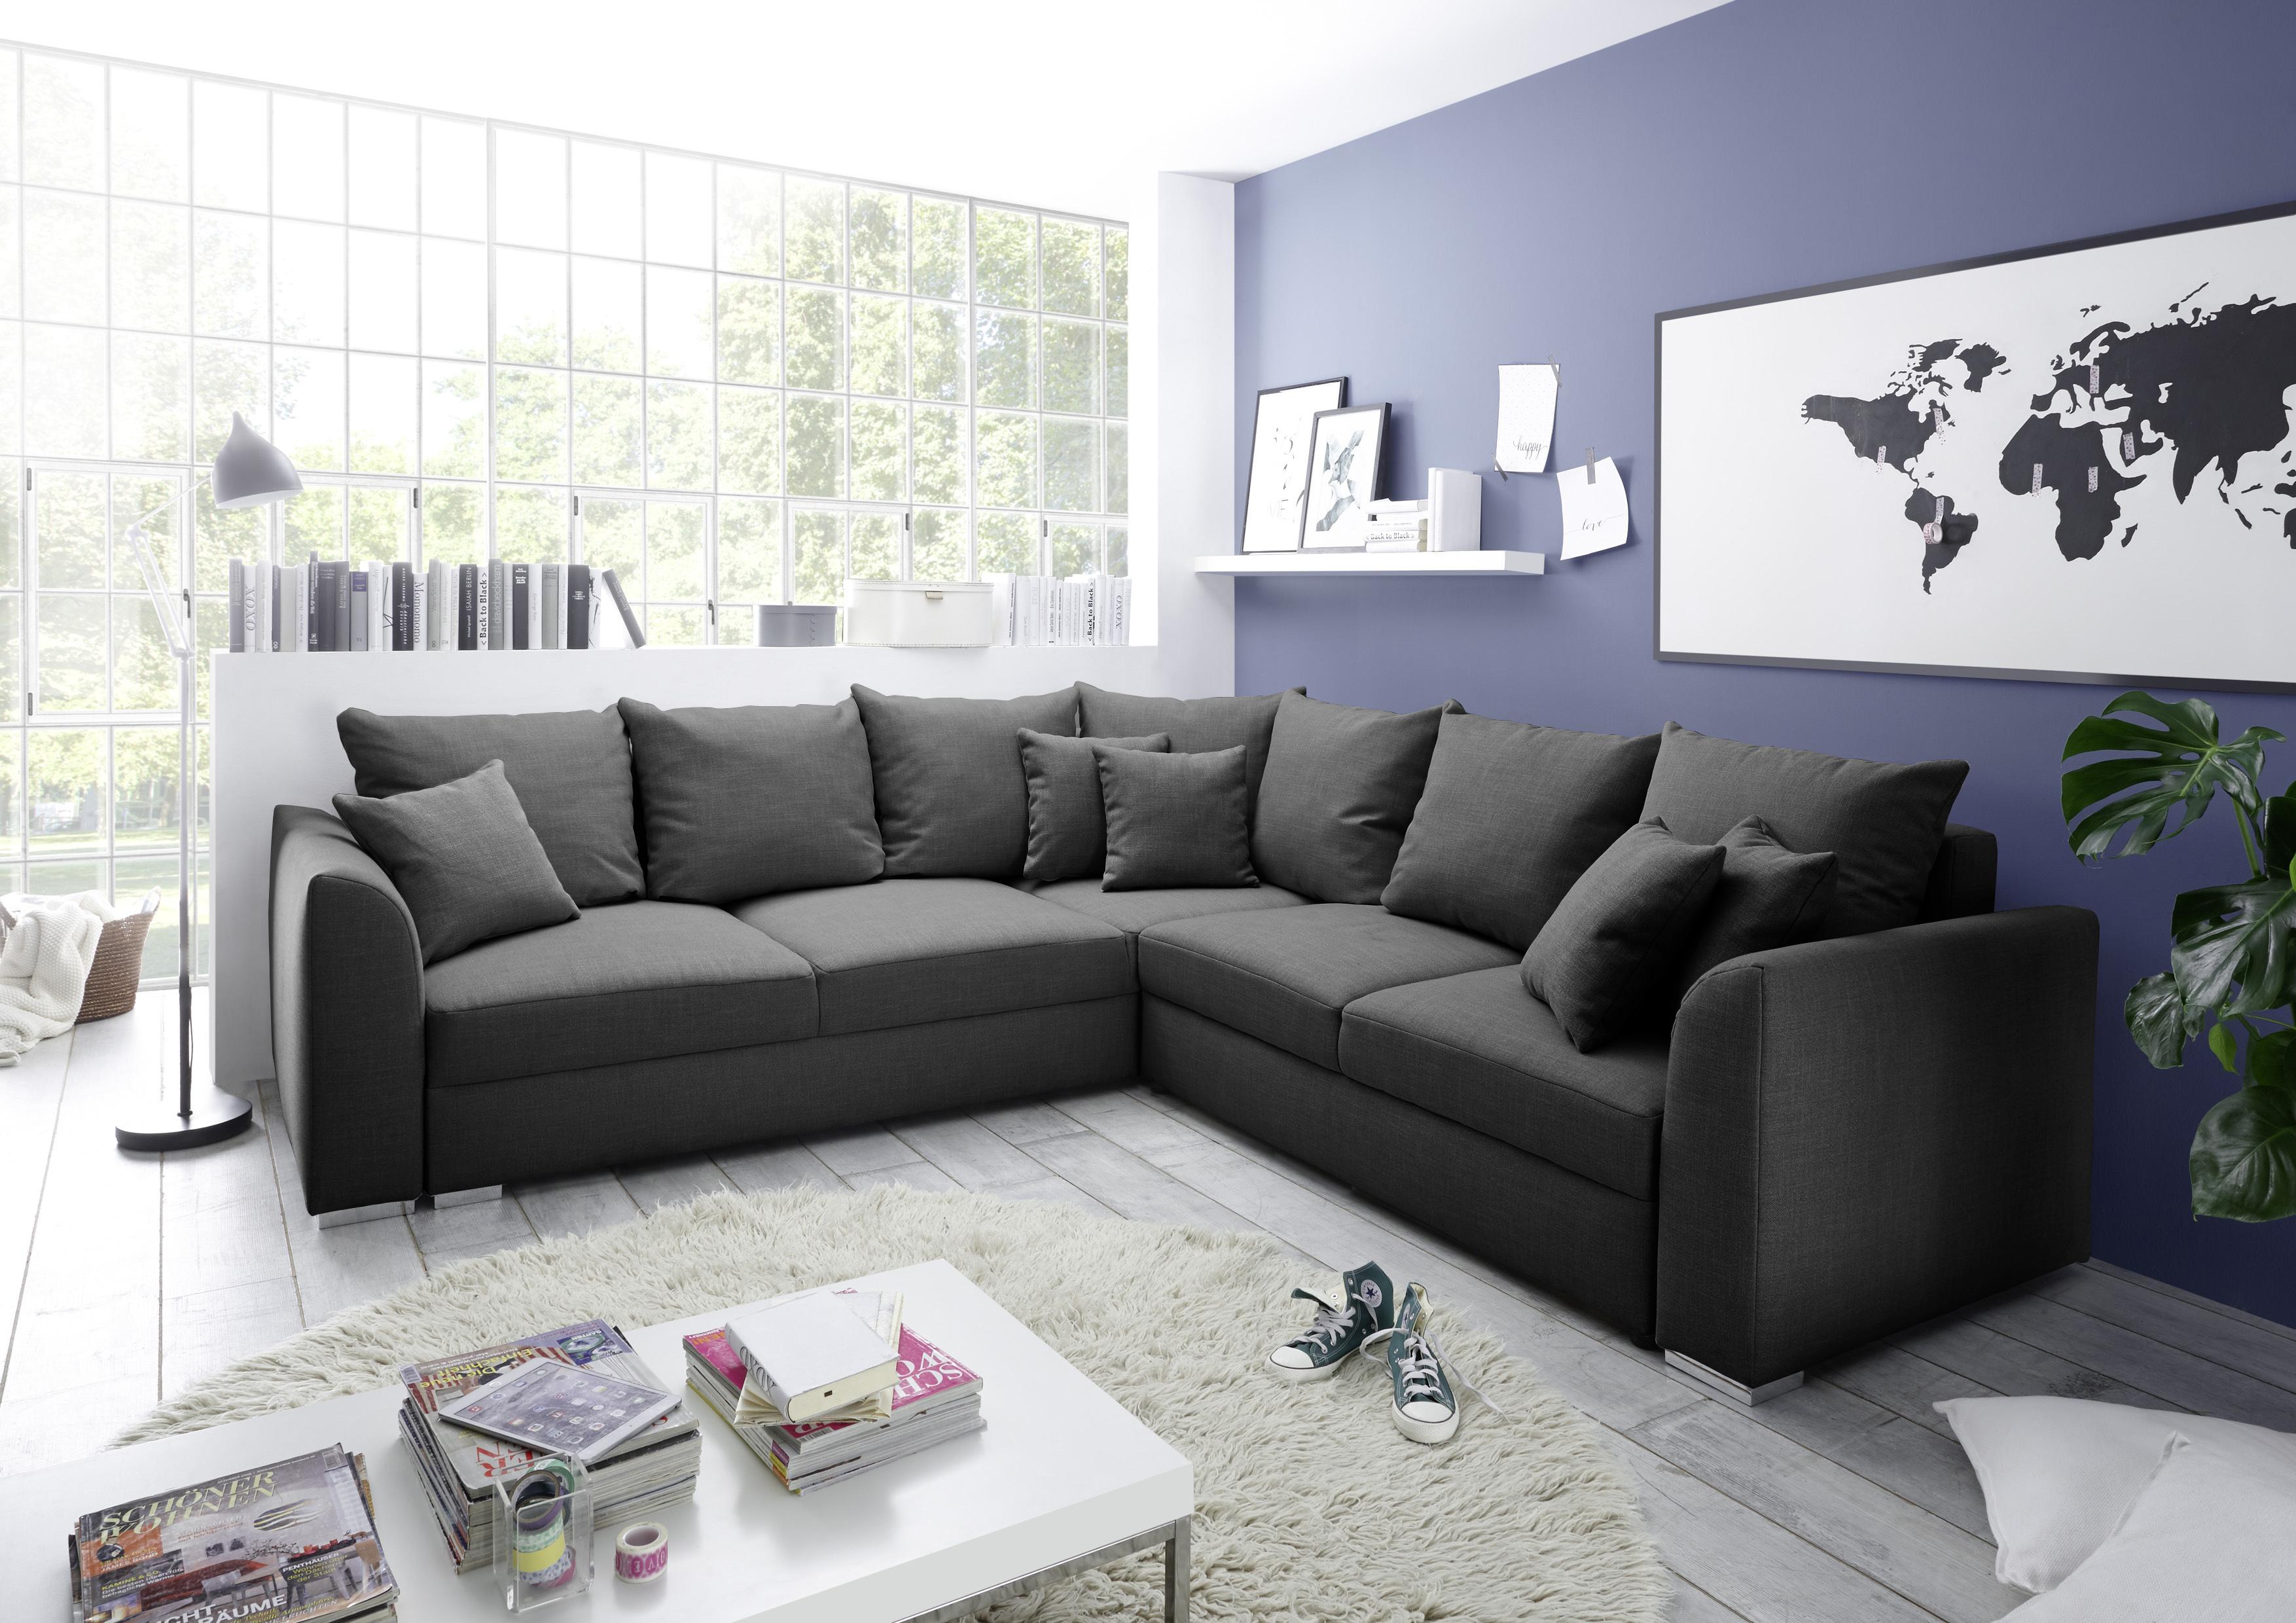 couch sofa eckcouch ecksofa schlafsofa schlafcouch. Black Bedroom Furniture Sets. Home Design Ideas